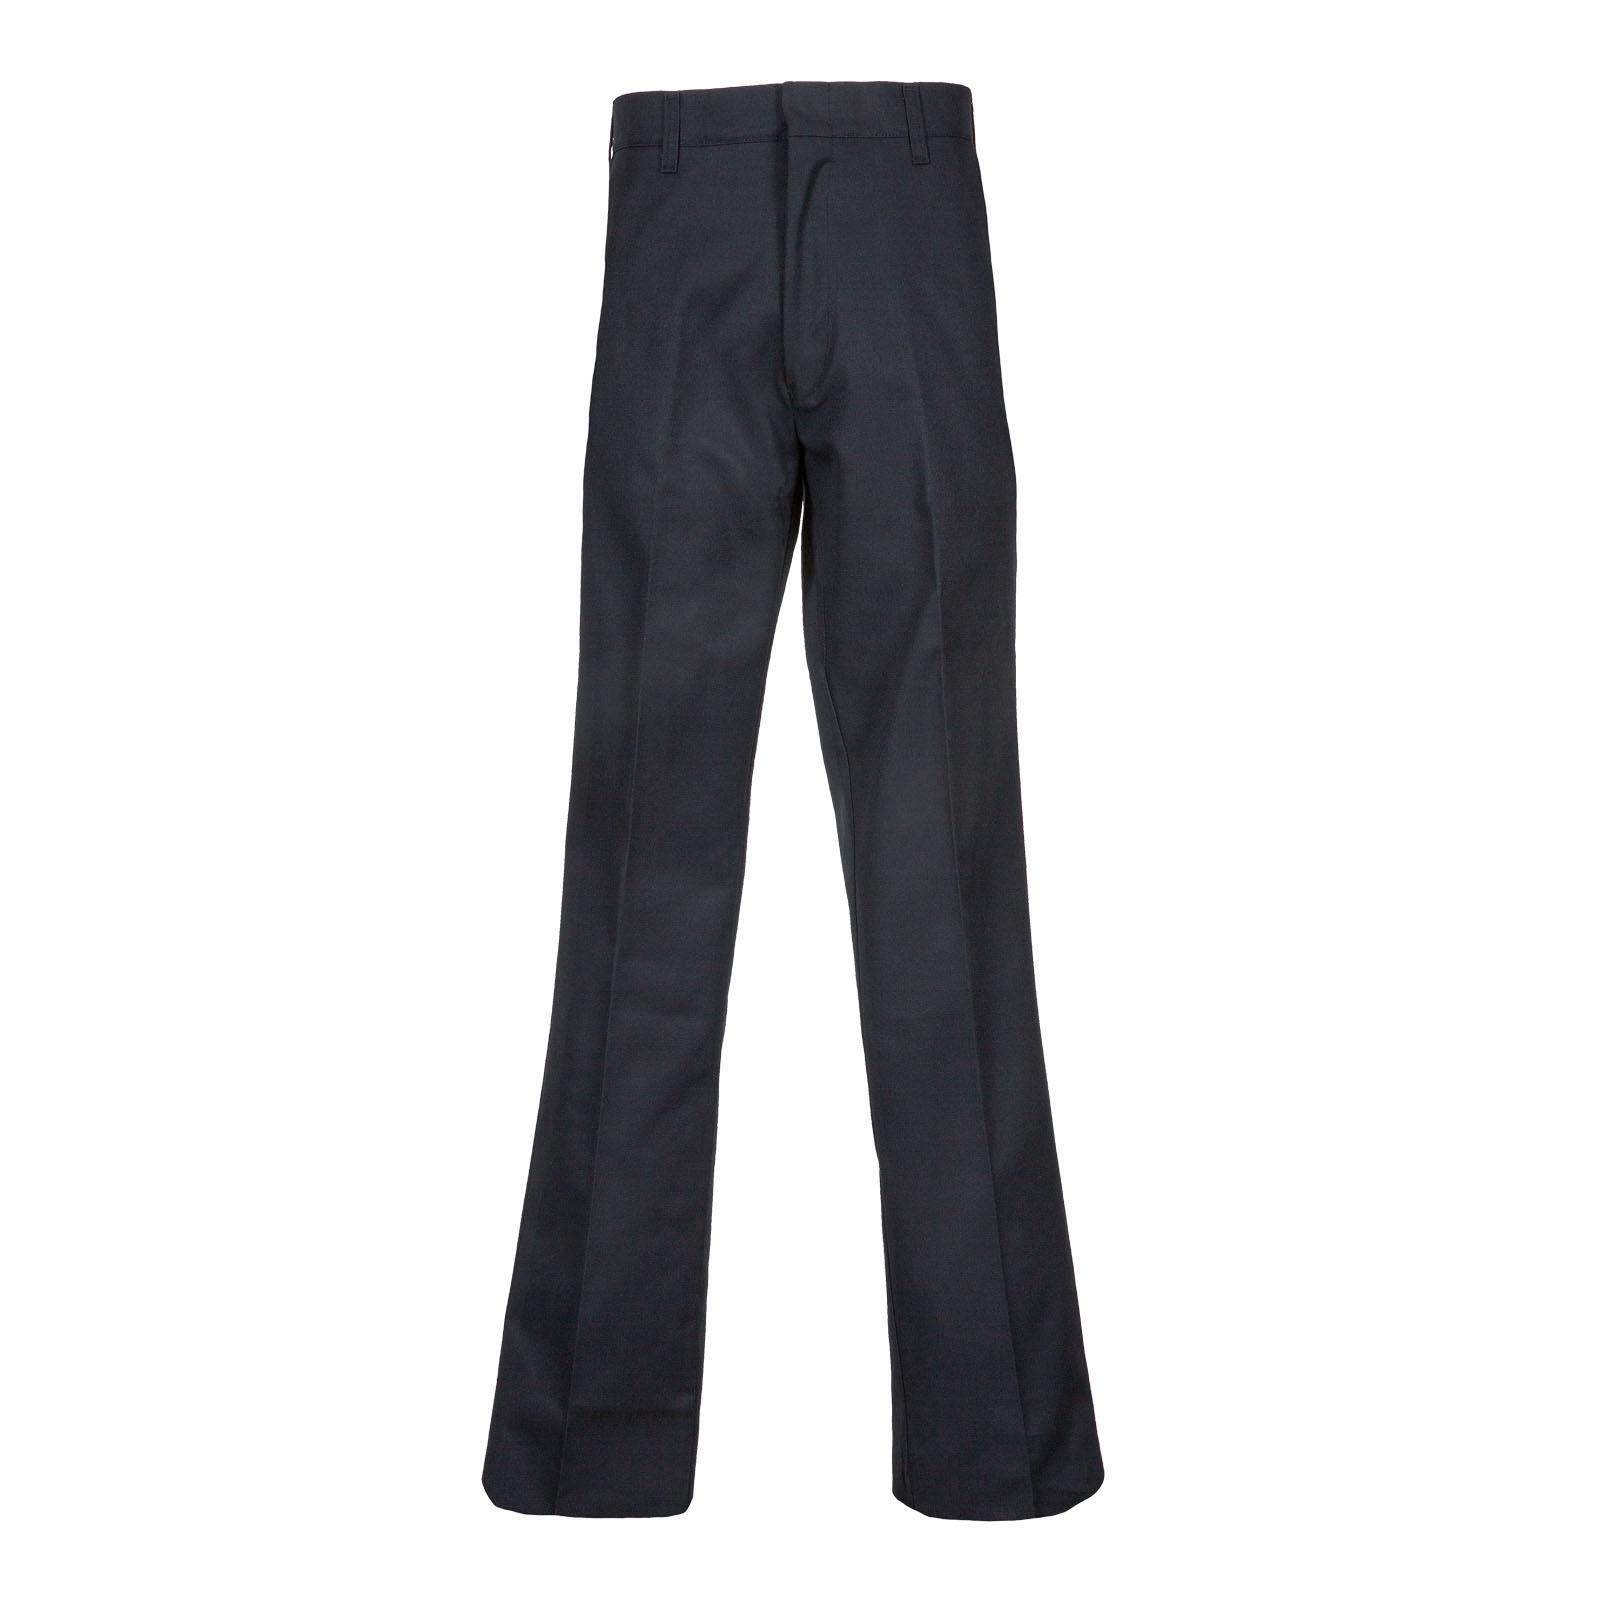 65/35 Comfort Twill Work Horse Uniform Pant-